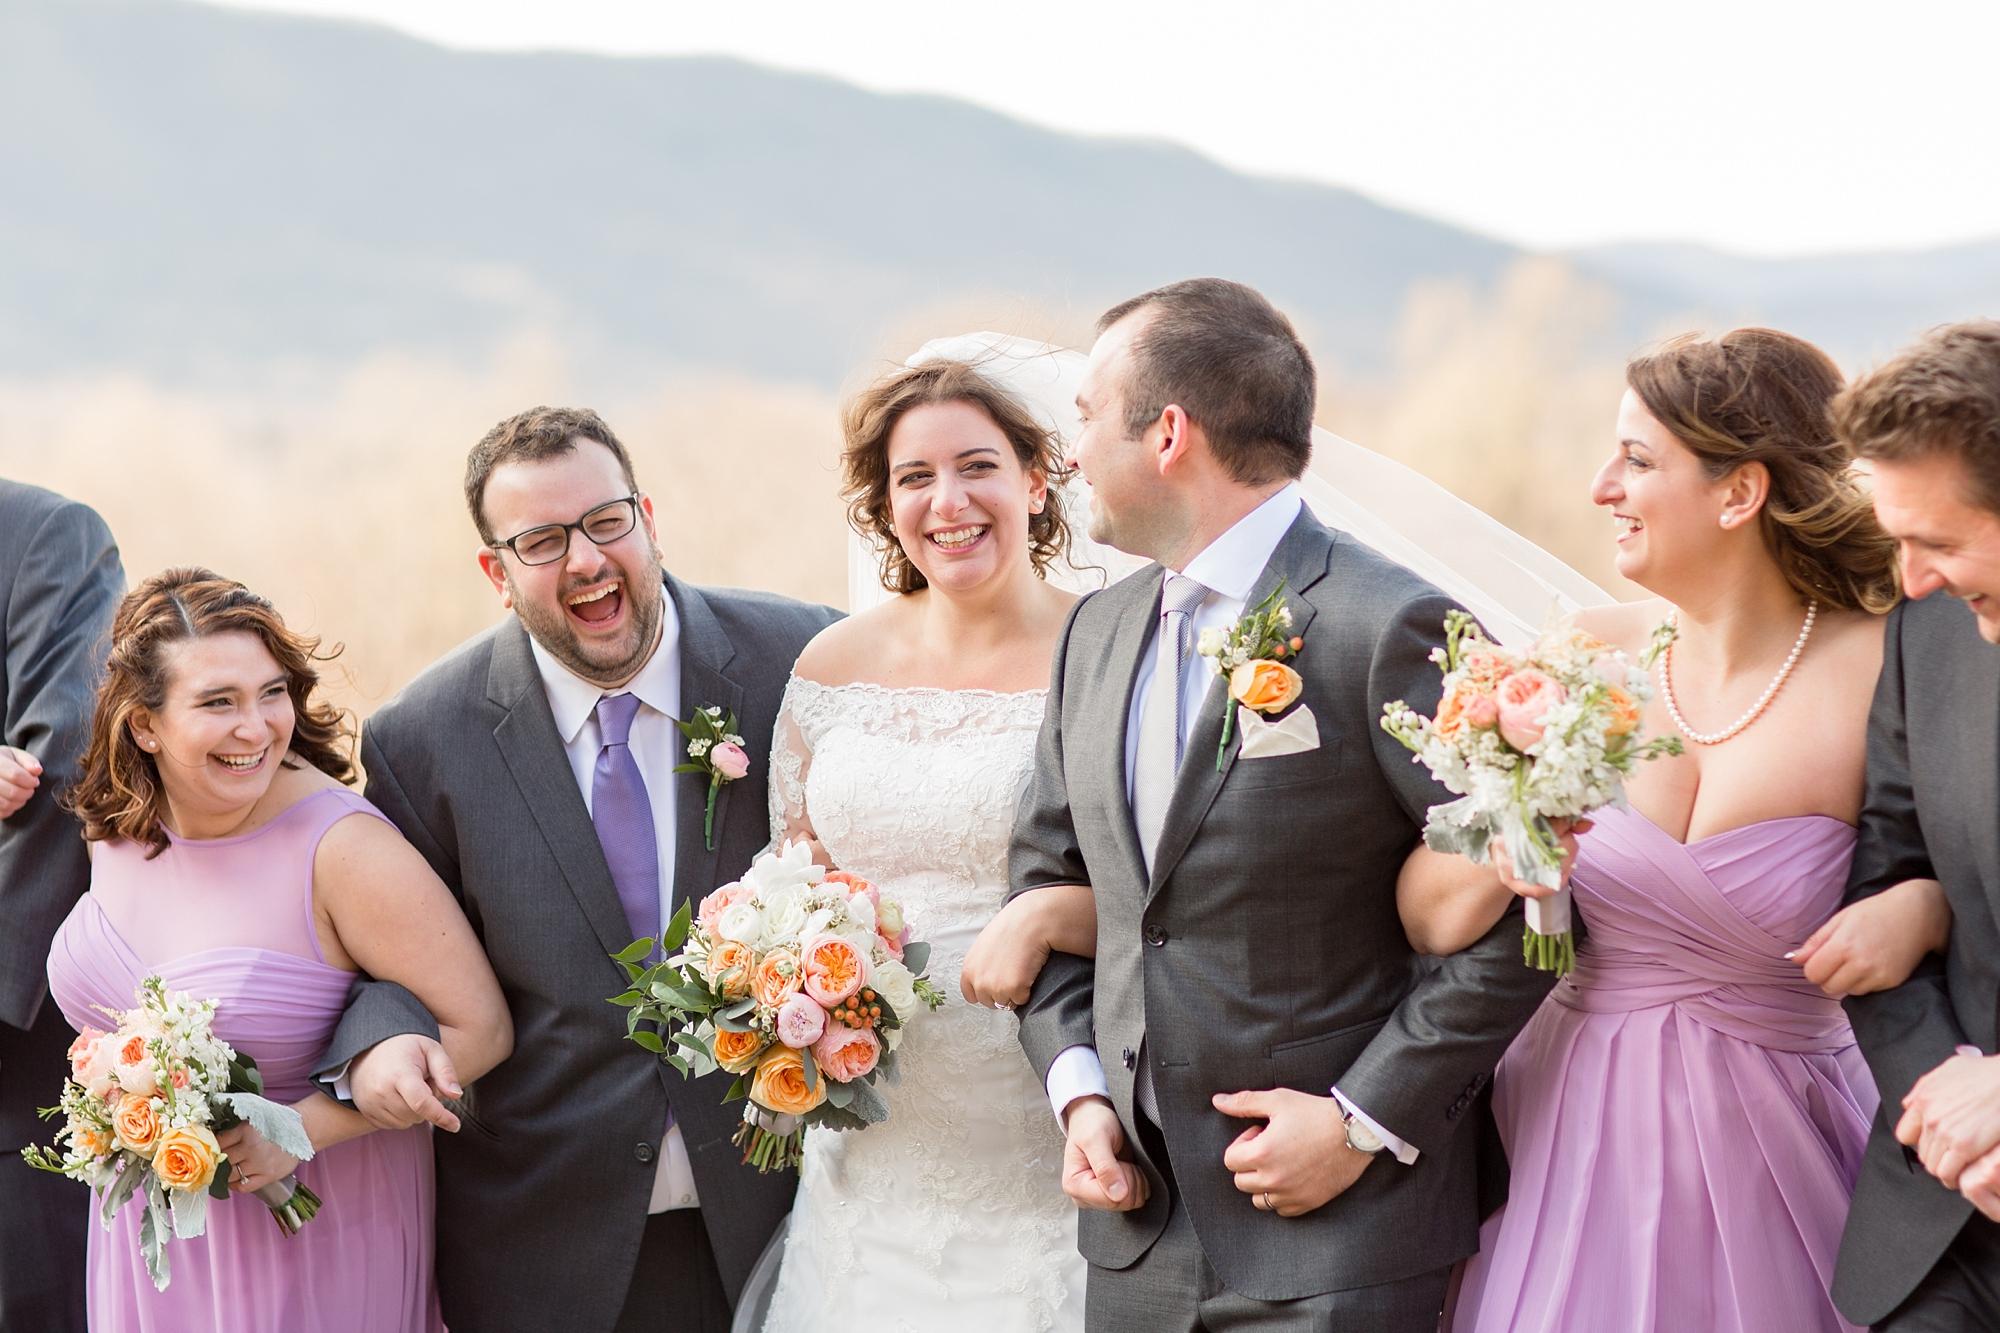 Simpson 2-Bridal Party-723_anna grace photography virginia wedding photographer irvine estate photo.jpg